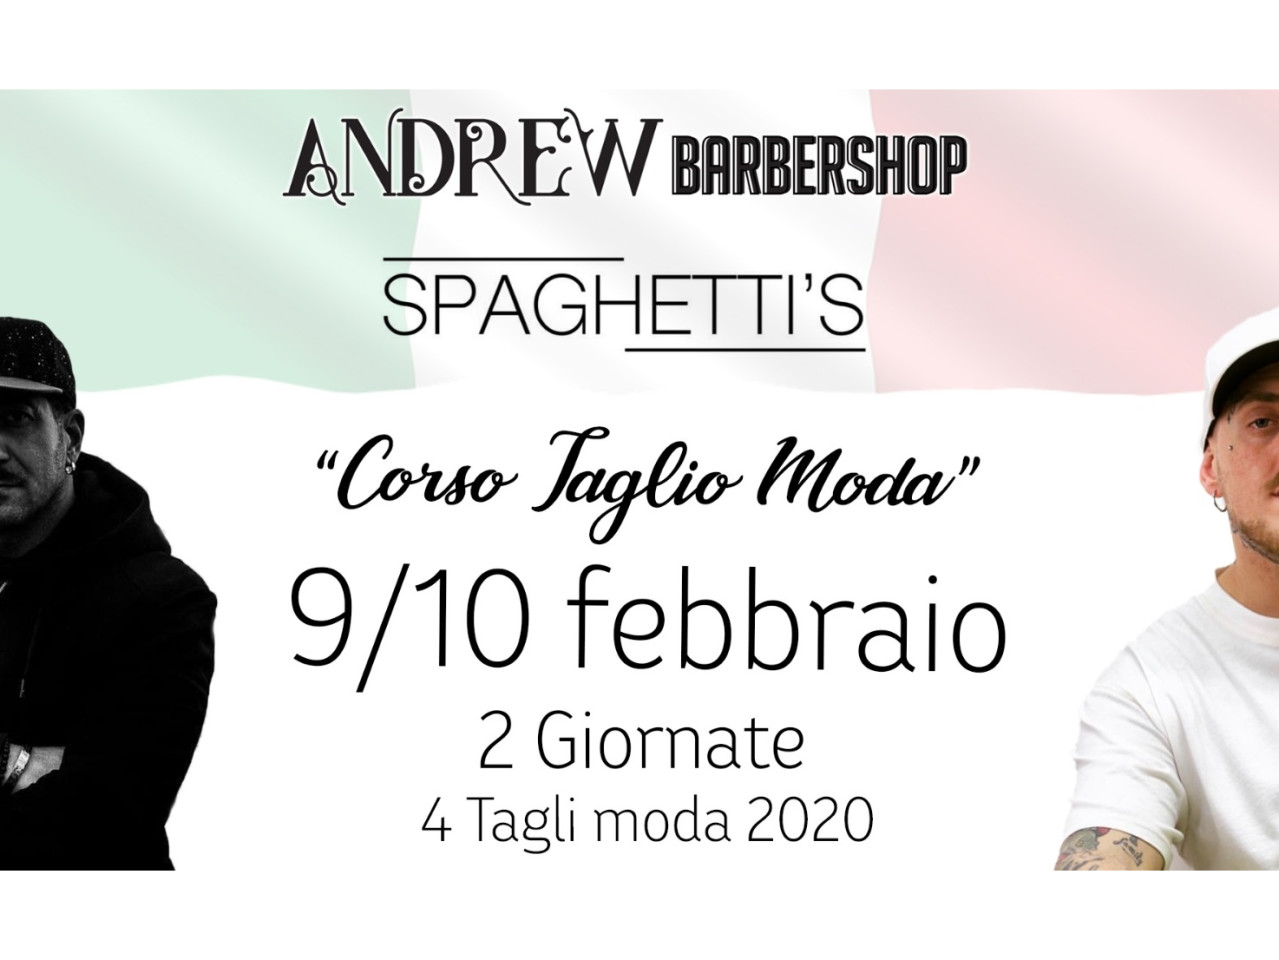 Academy Andrew Barbershop con Woody Spaghetti's - Look visual  2020